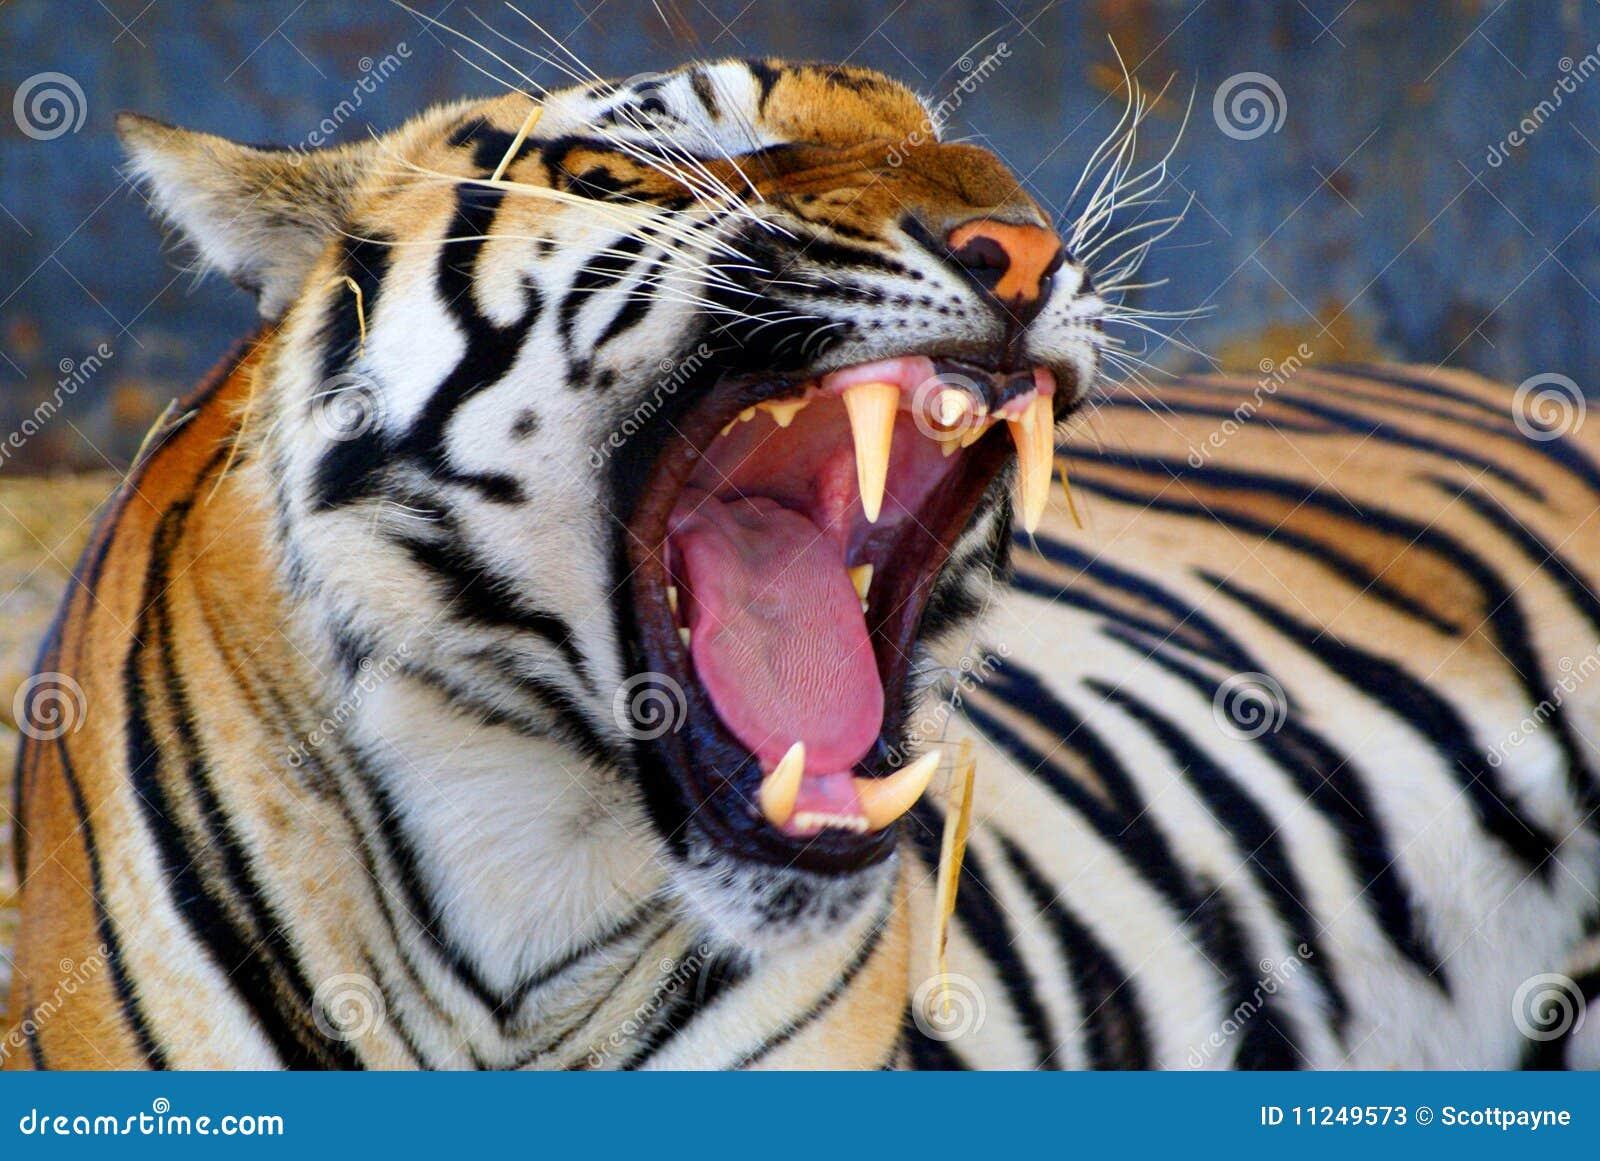 Tigers Teeth Stock Photos - Image: 11249573